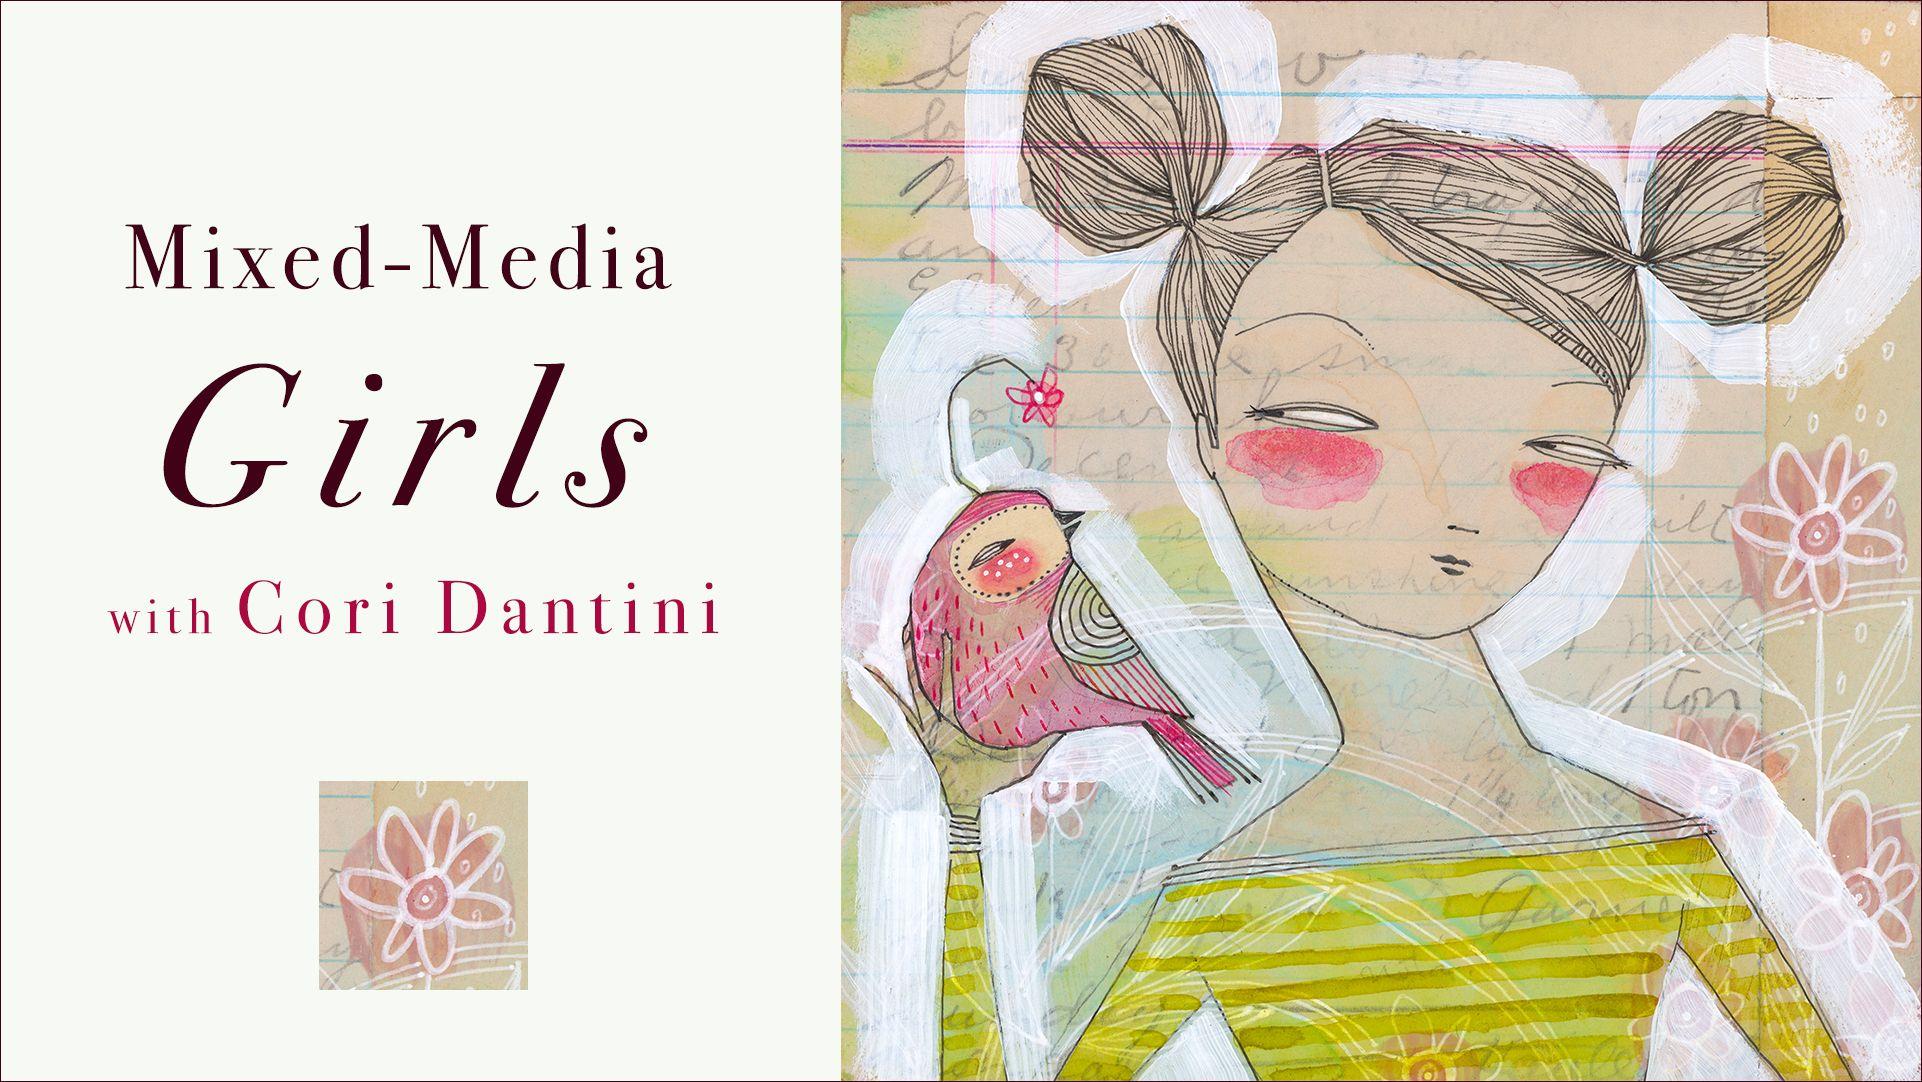 Mixed Media Girls With Cori Dantini Carla Sonheim Presents Mixed Media Art Journaling Mixed Media Artist Trading Cards